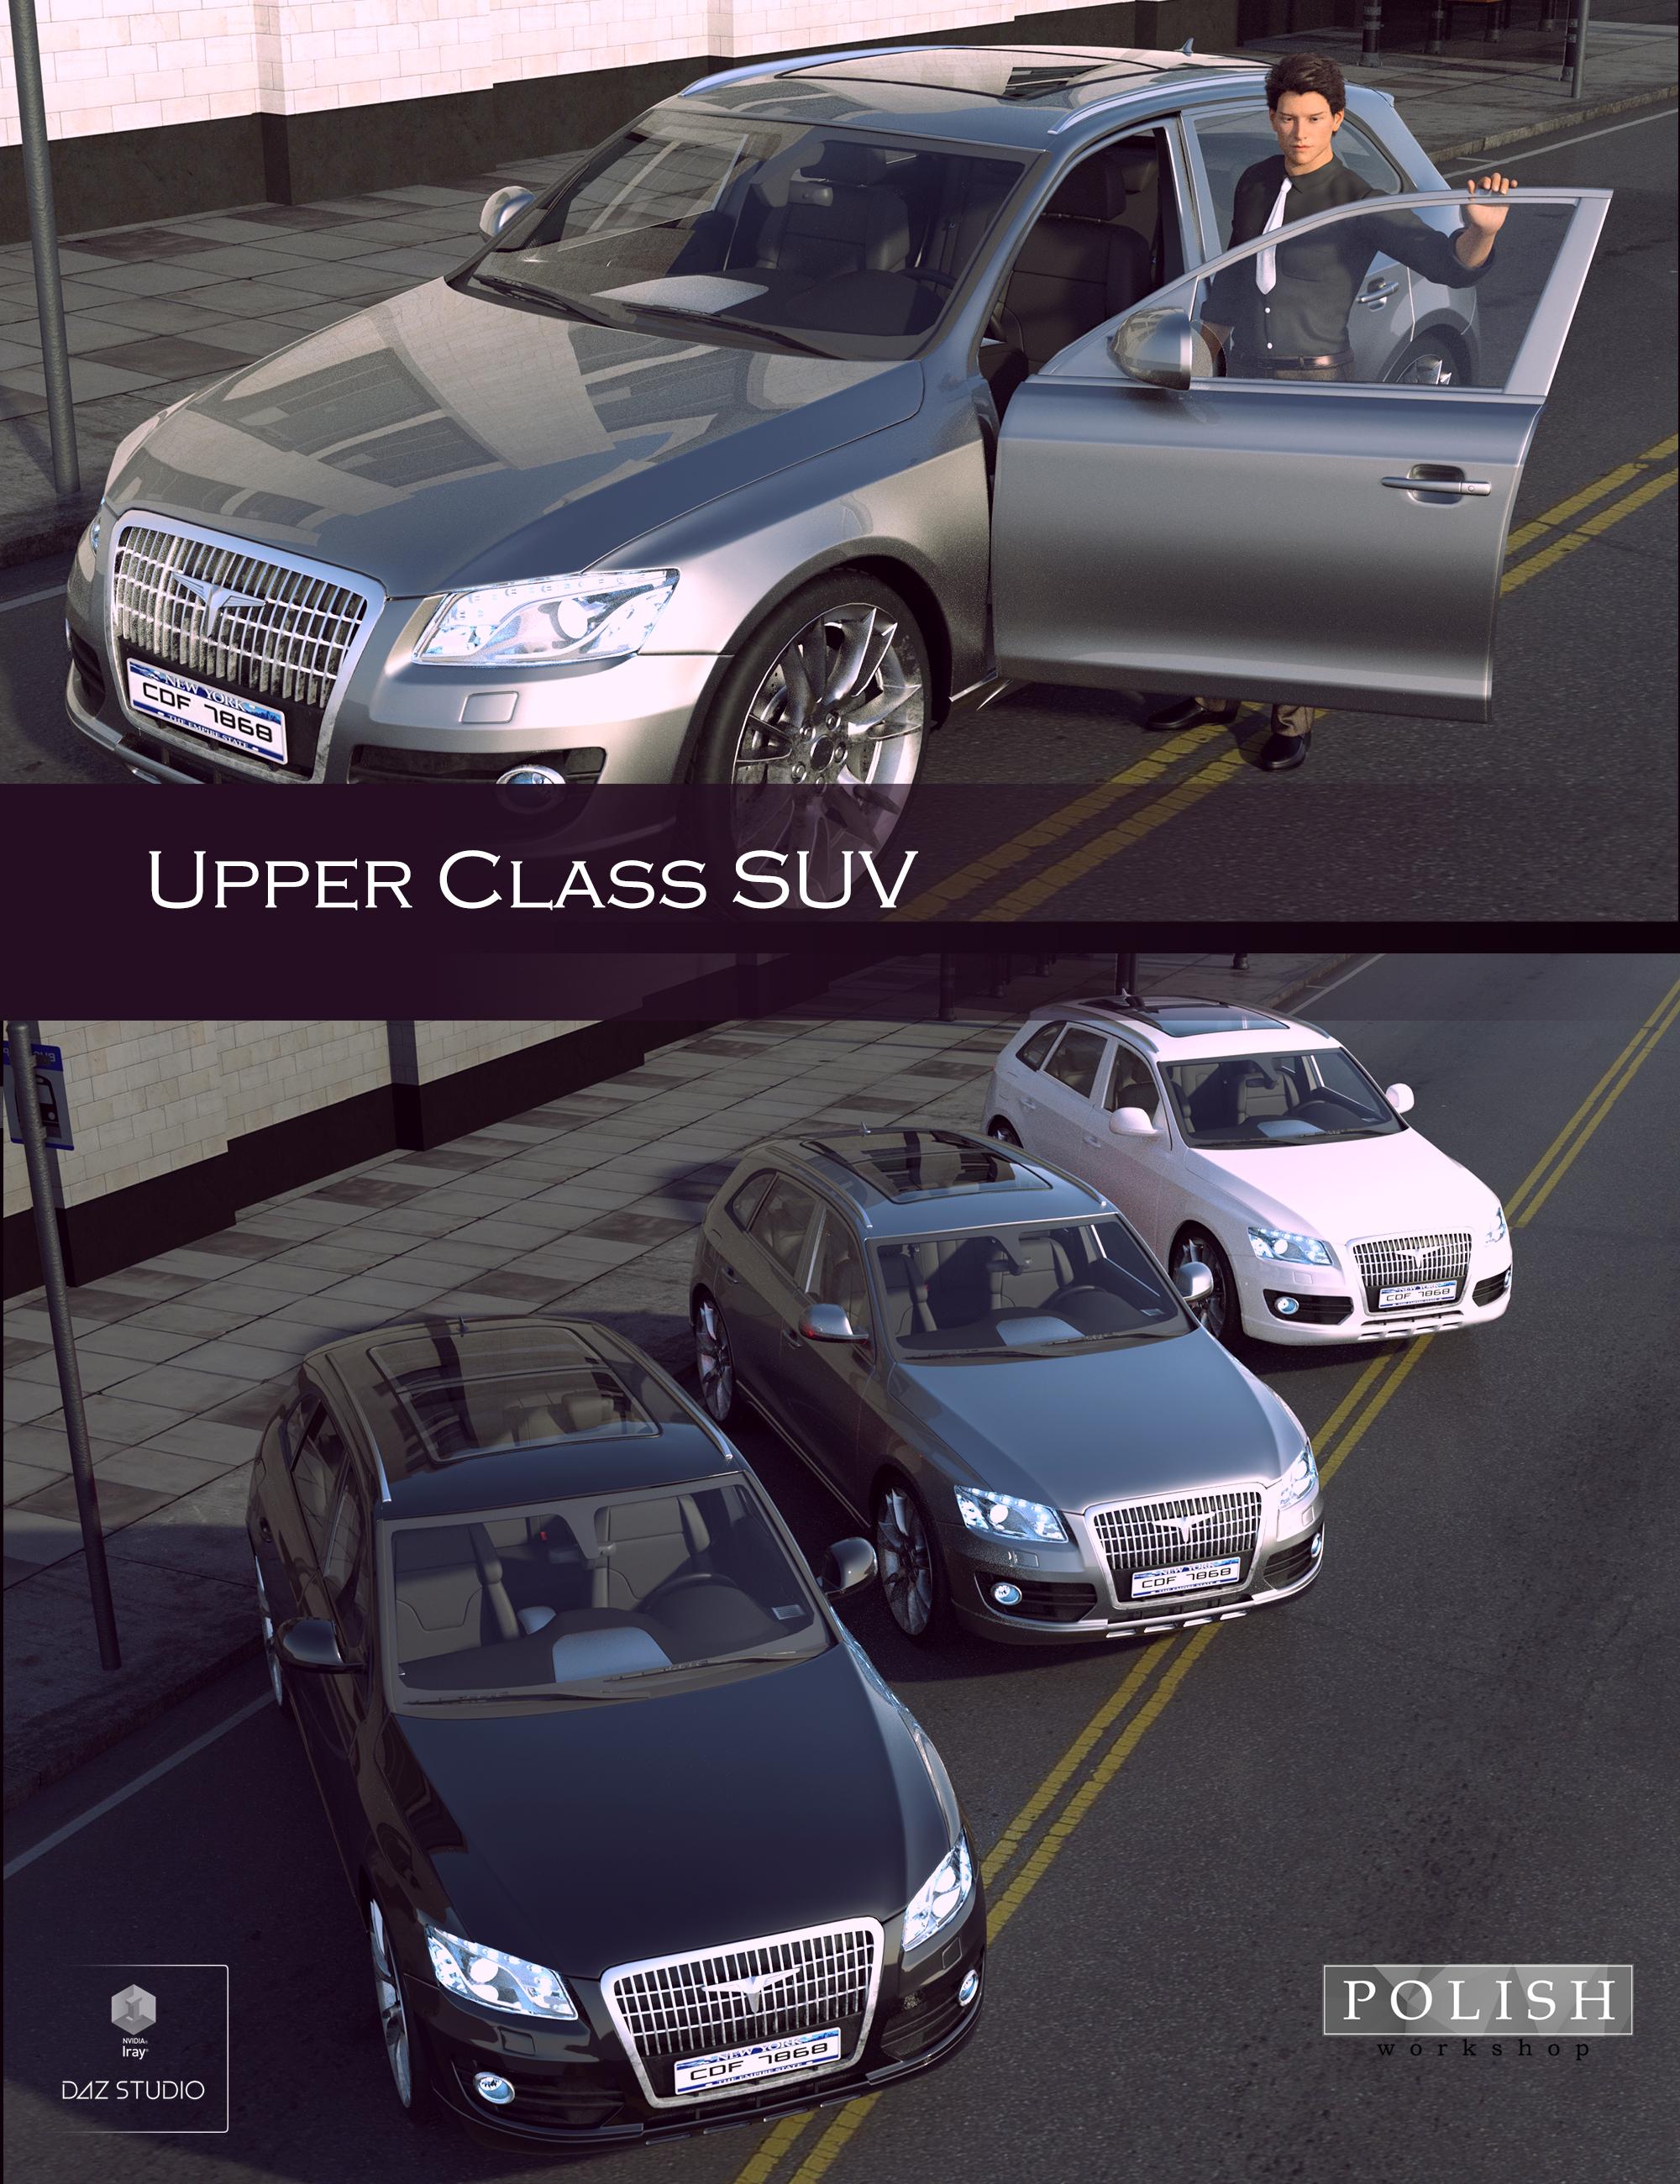 Upper Class SUV by: Polish, 3D Models by Daz 3D